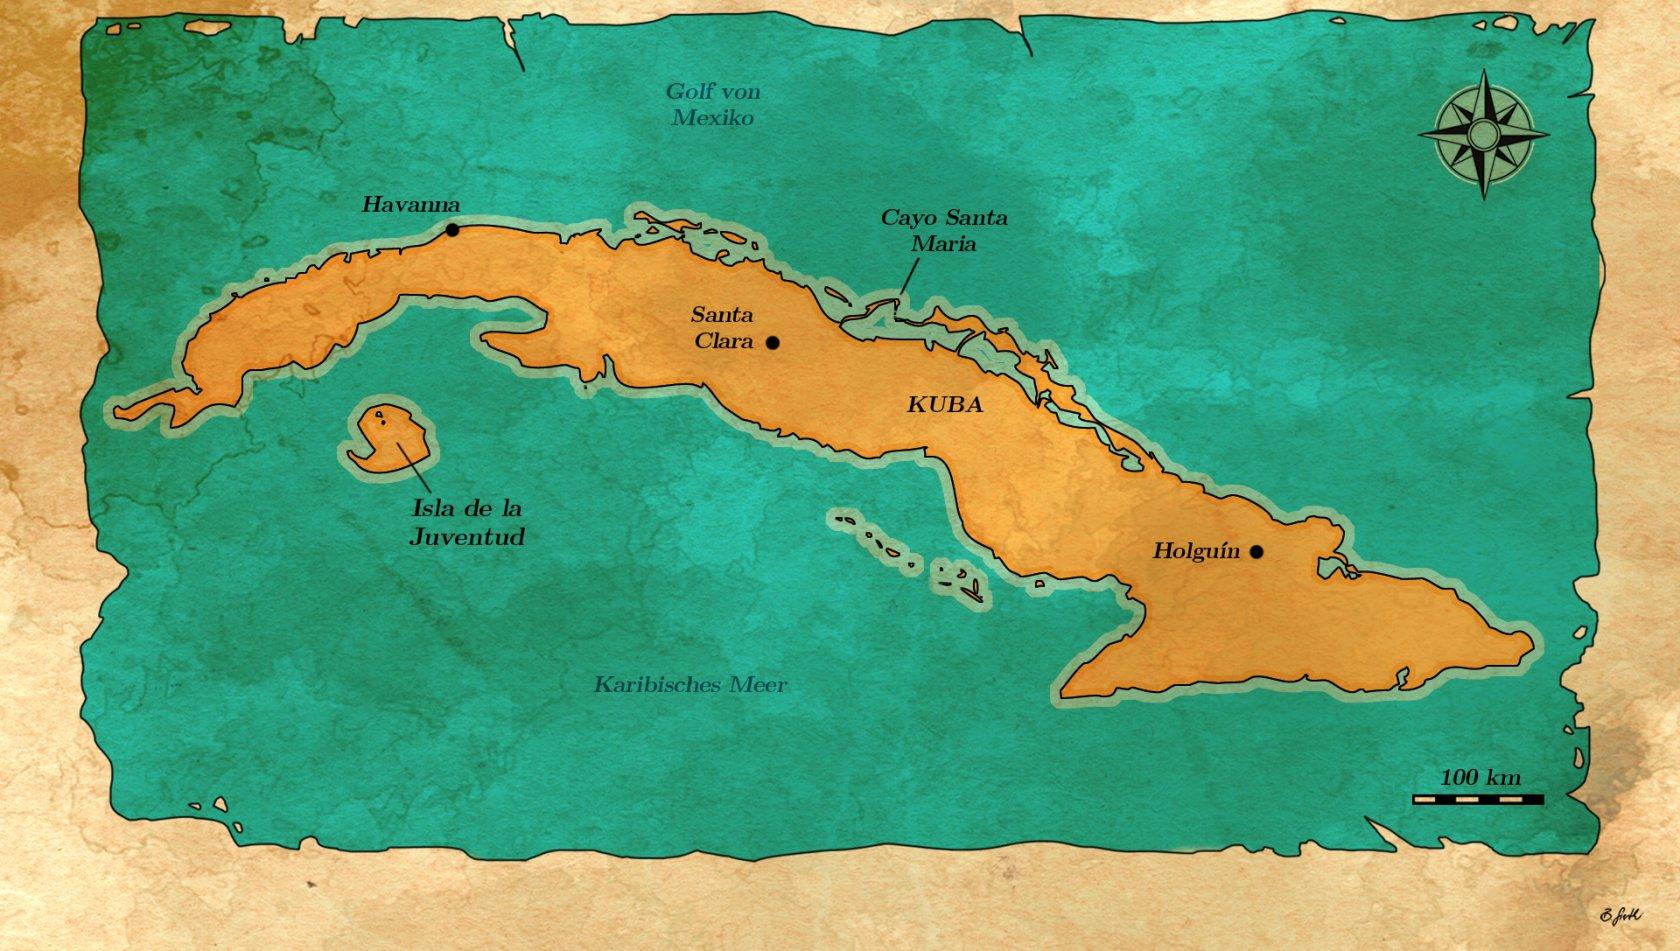 Cayo Santa Maria Angeln Kuba